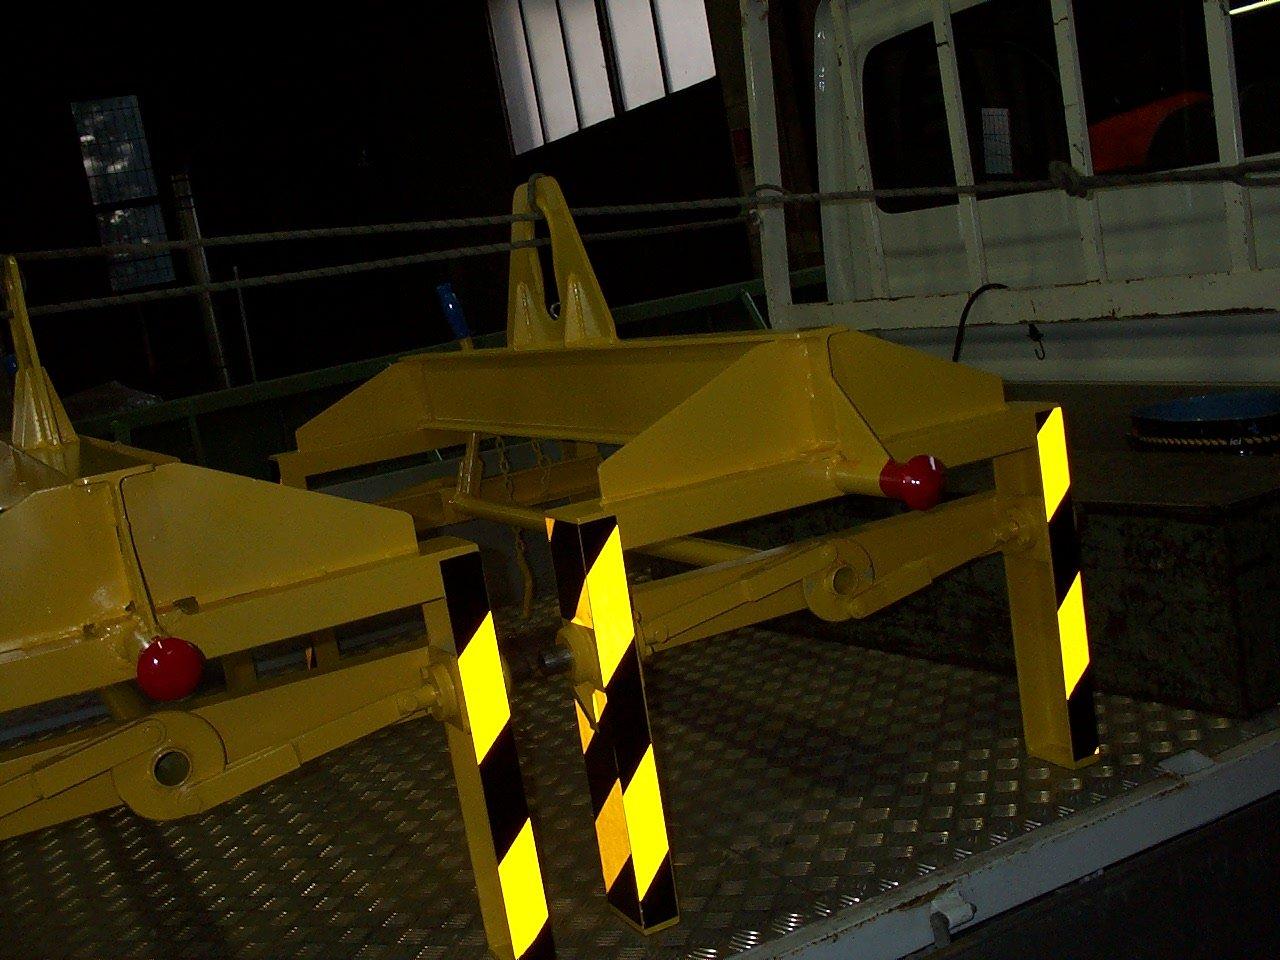 macchinari gialli